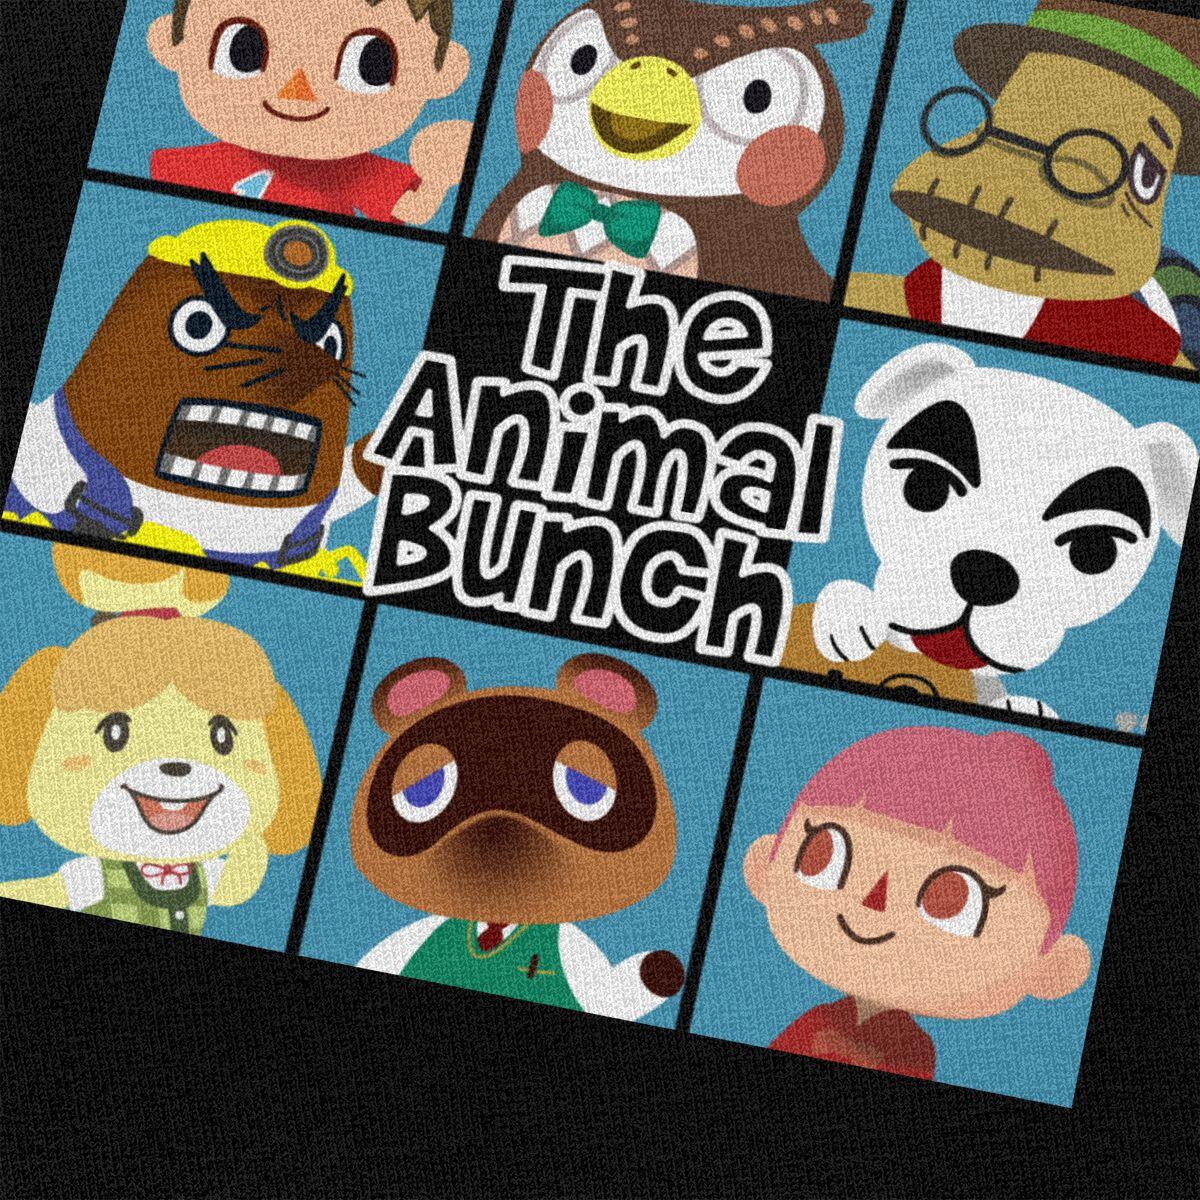 Animal Crossing Brady Bunch Style Shirt, Black / XS